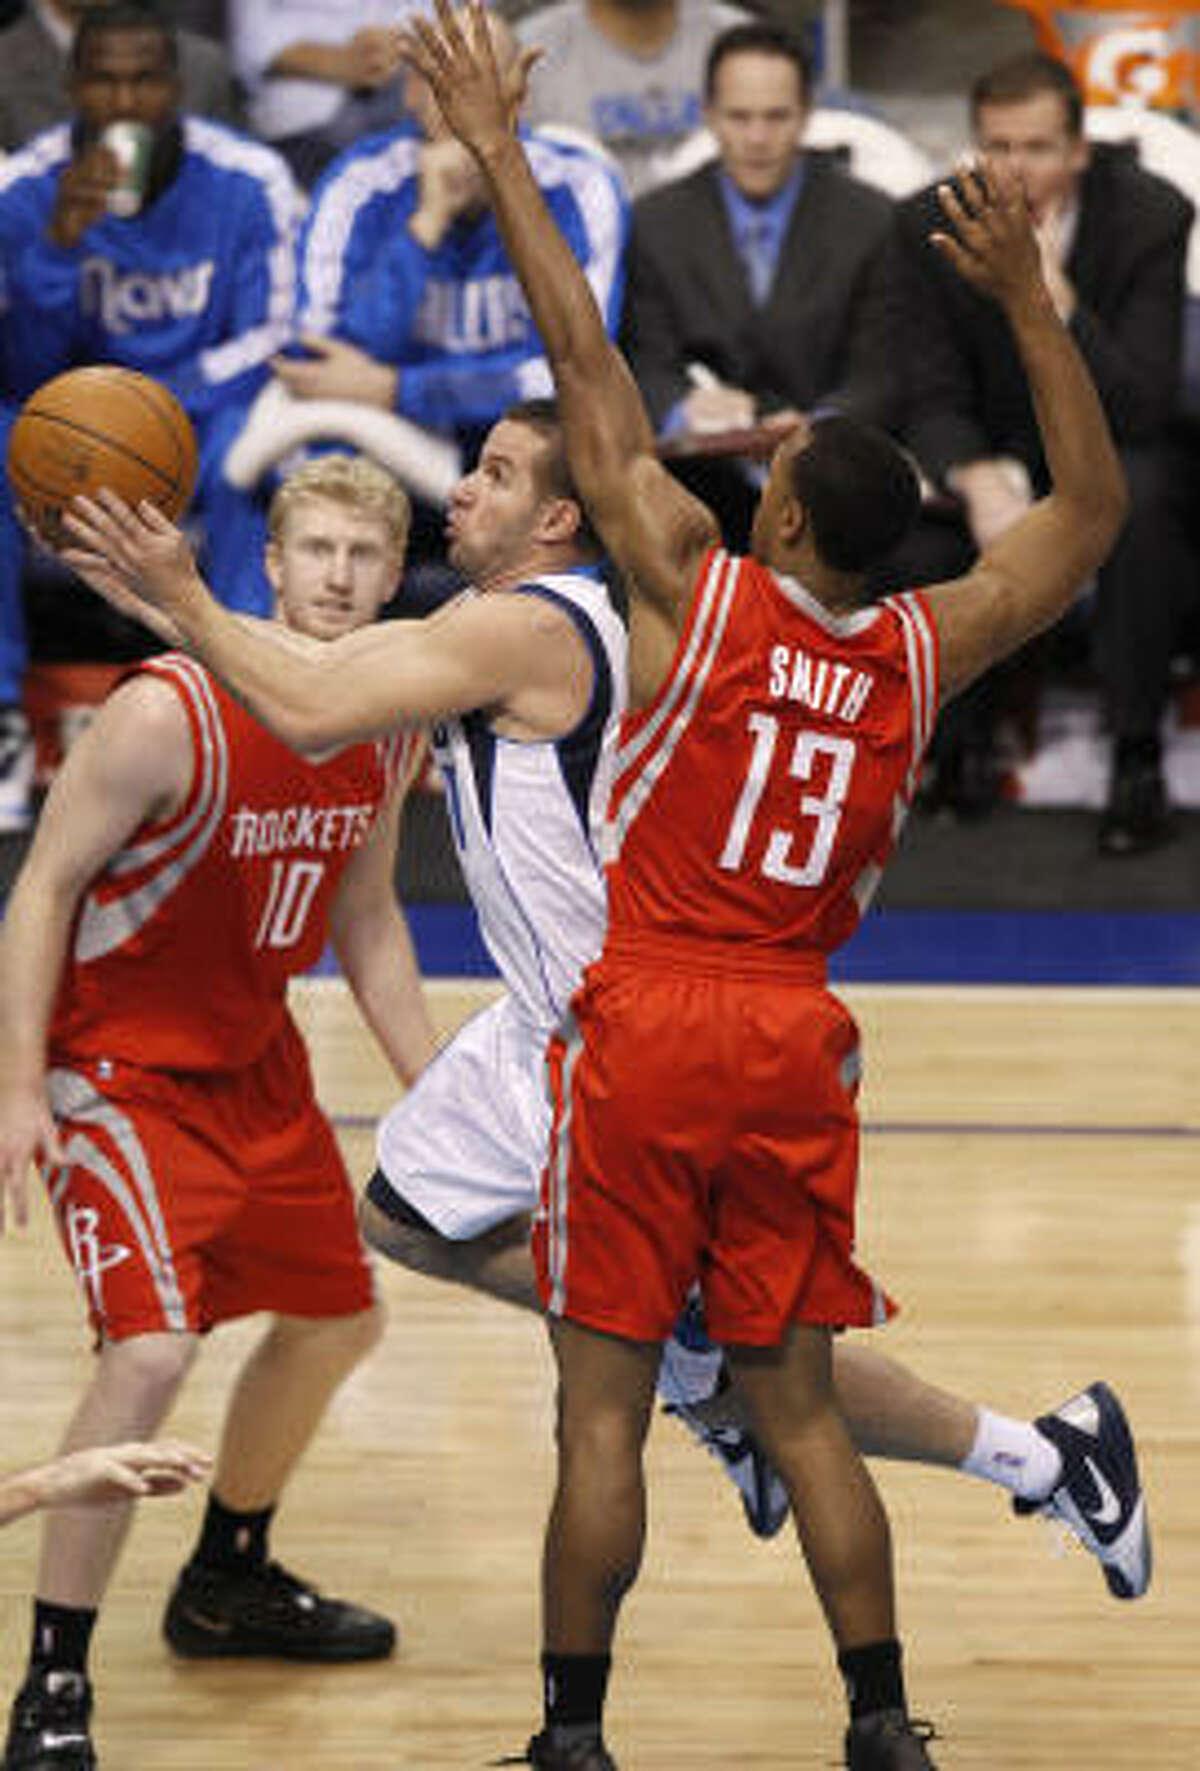 Mavericks point guard Jose Juan Barea, center, drives between Rockets point guard Ishmael Smith (13) and Chase Budinger (10).